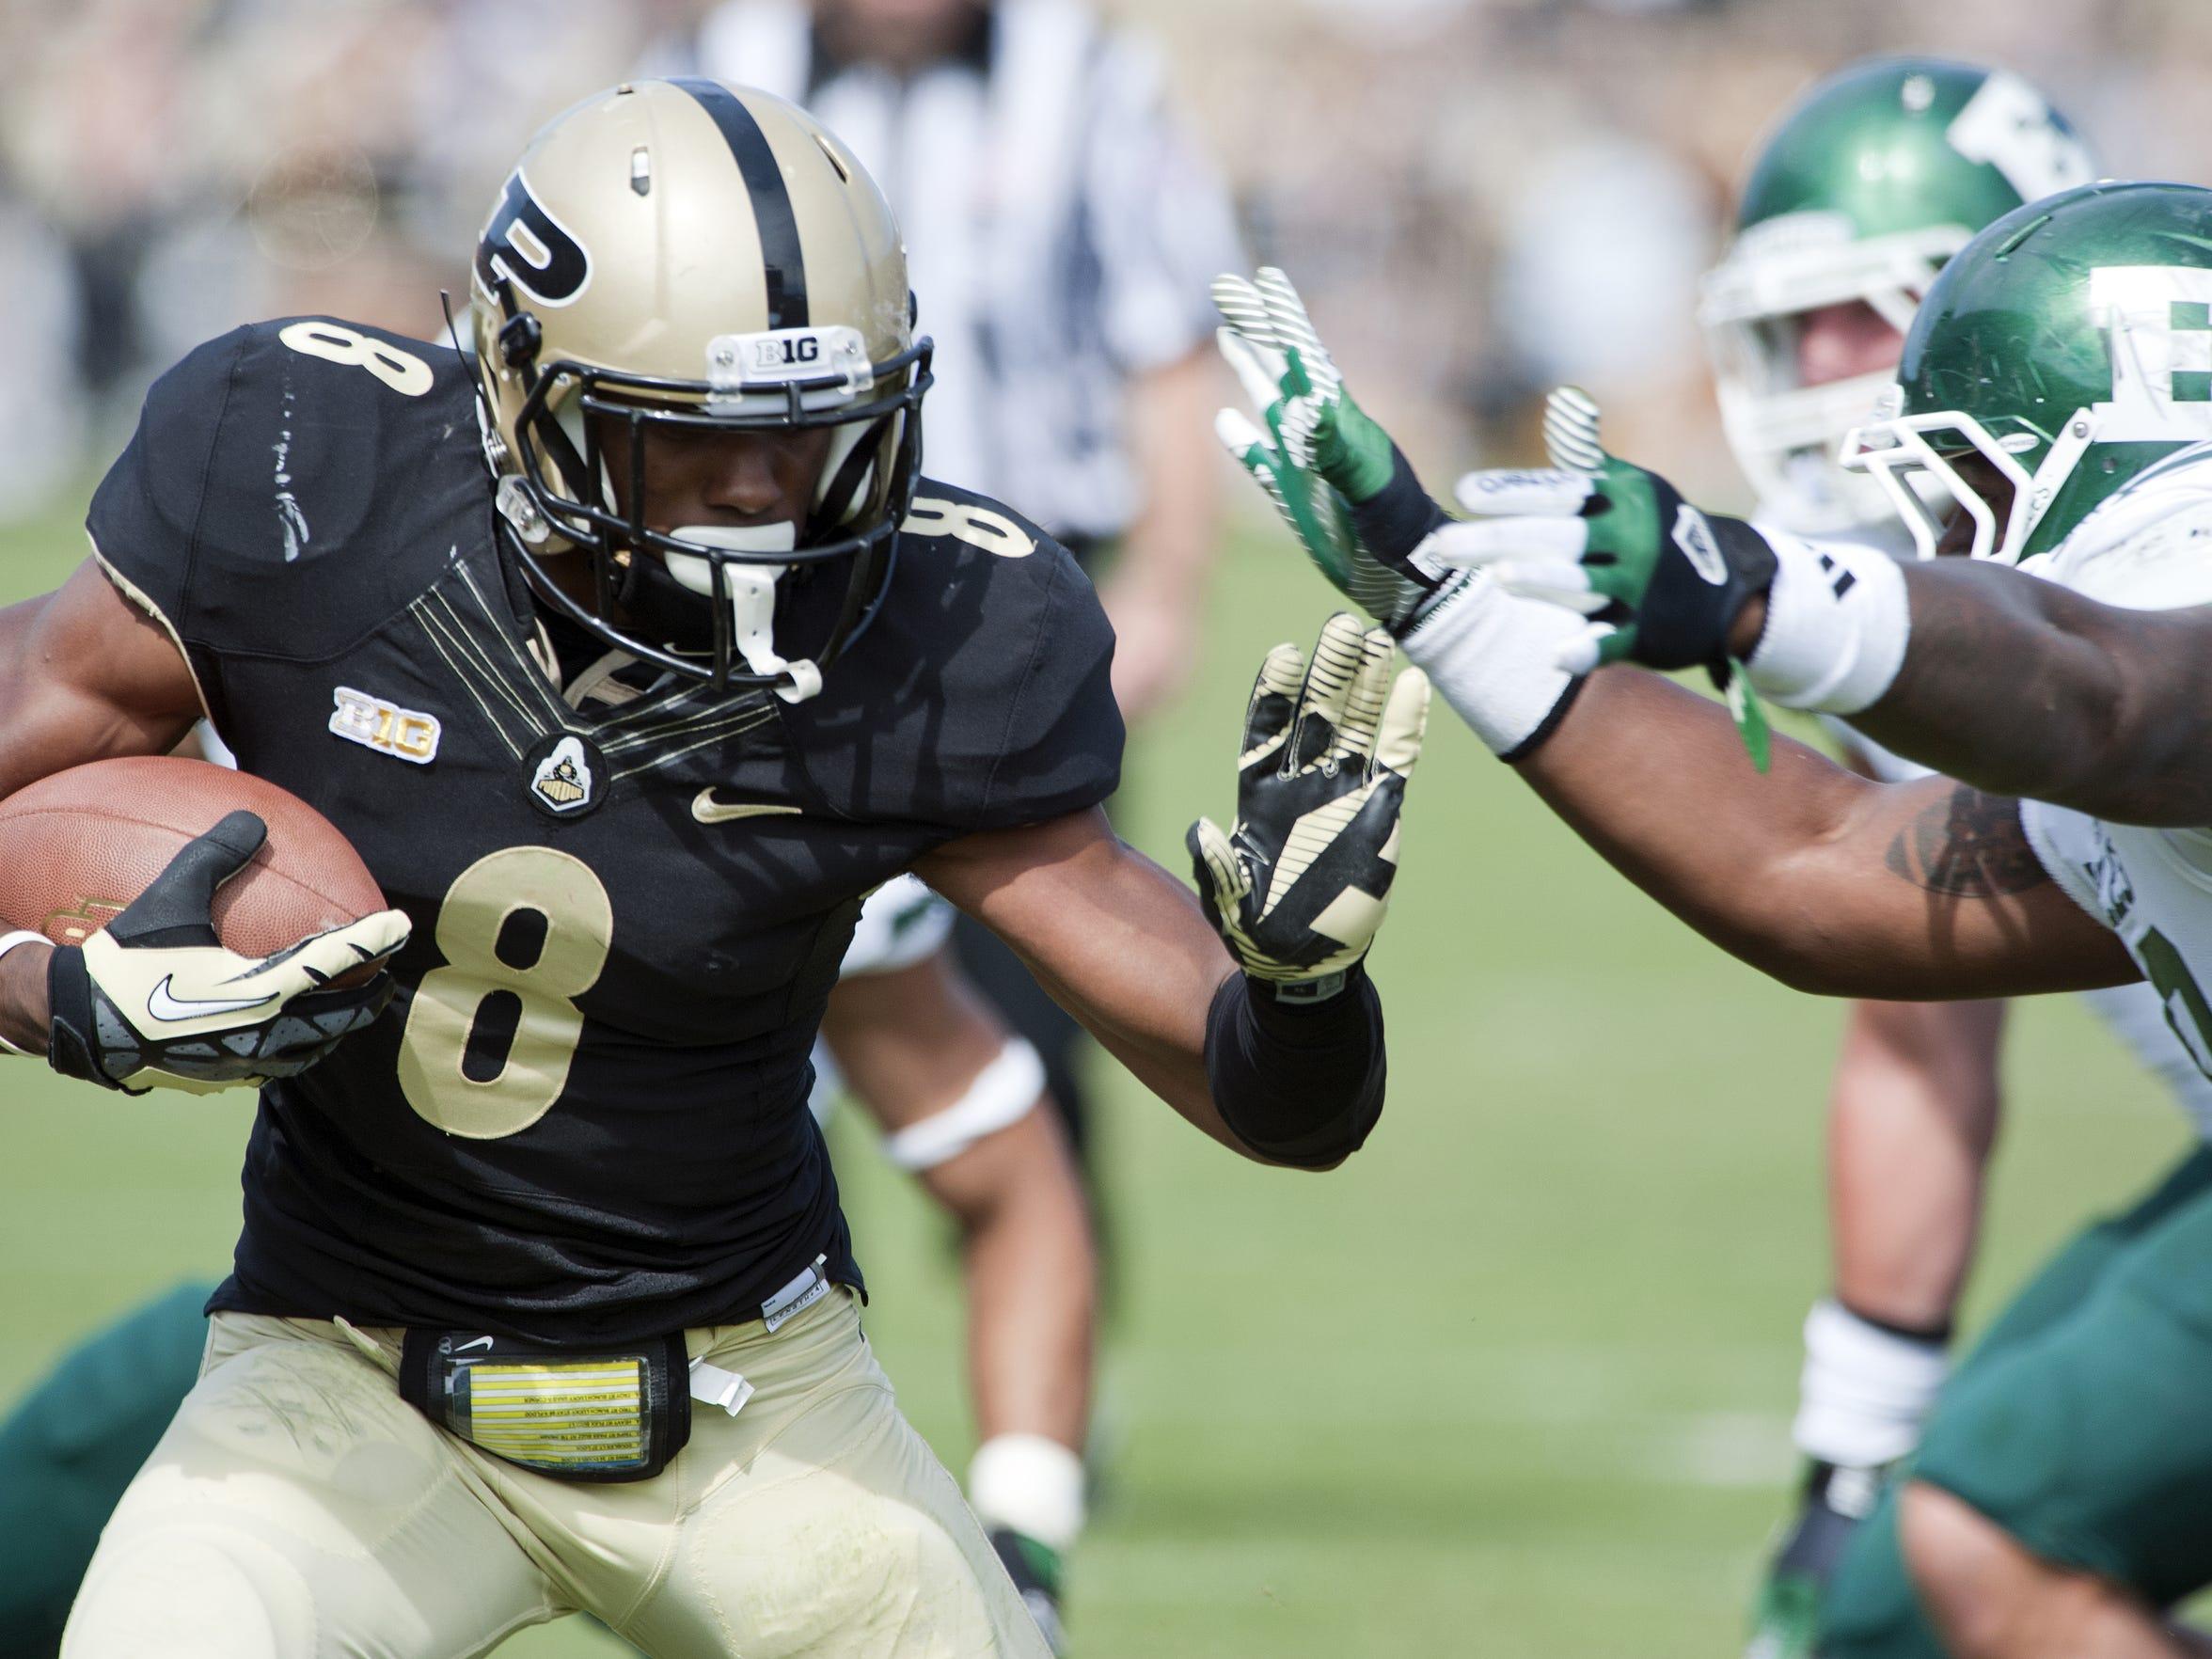 Purdue's Raheem Mostert carries the ball for a touchdown